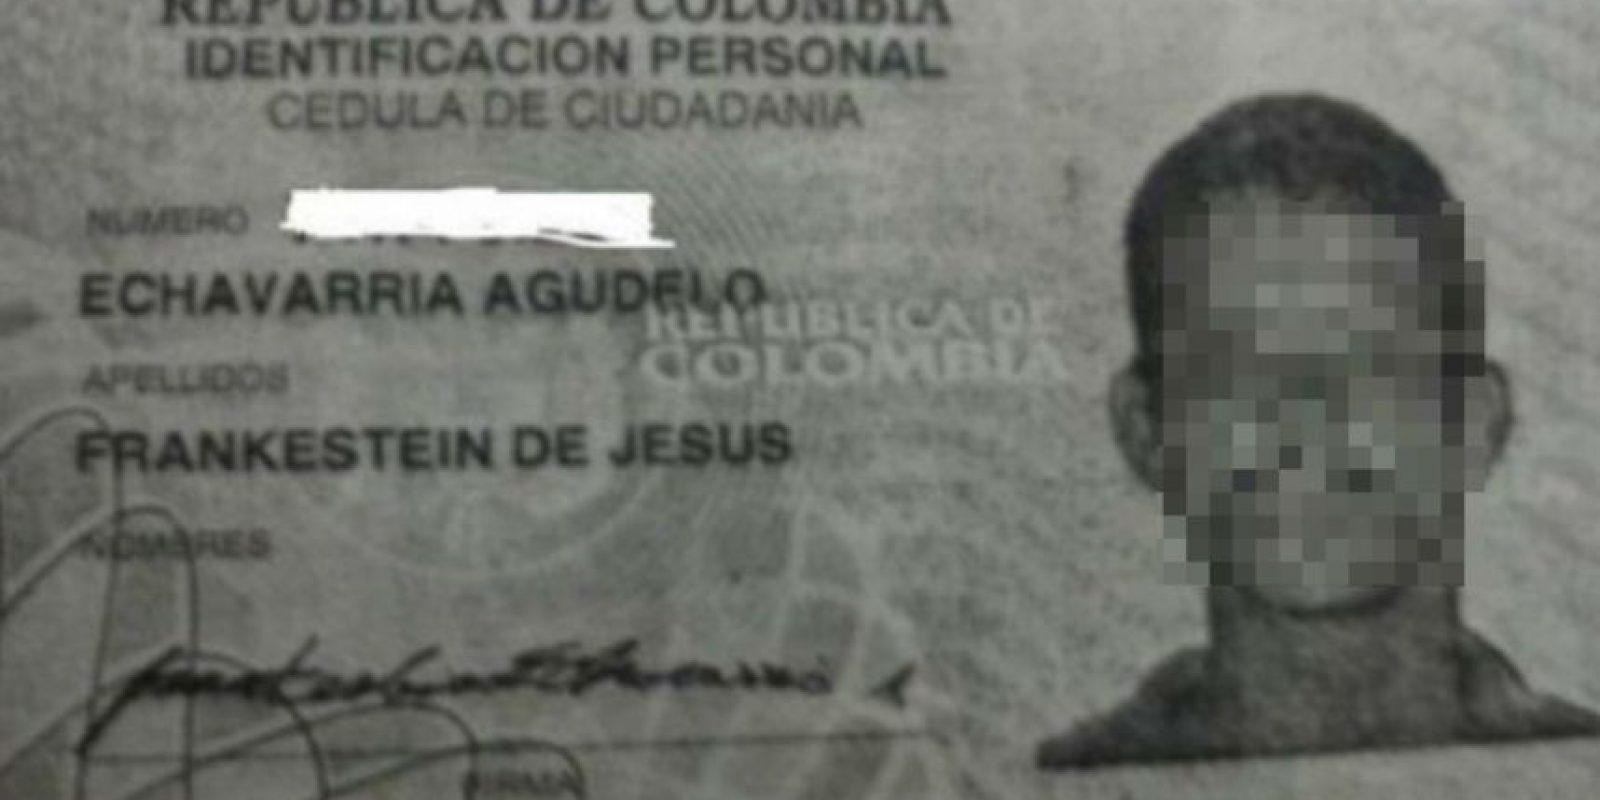 Frankestein de Jesús Foto:Recreoviral